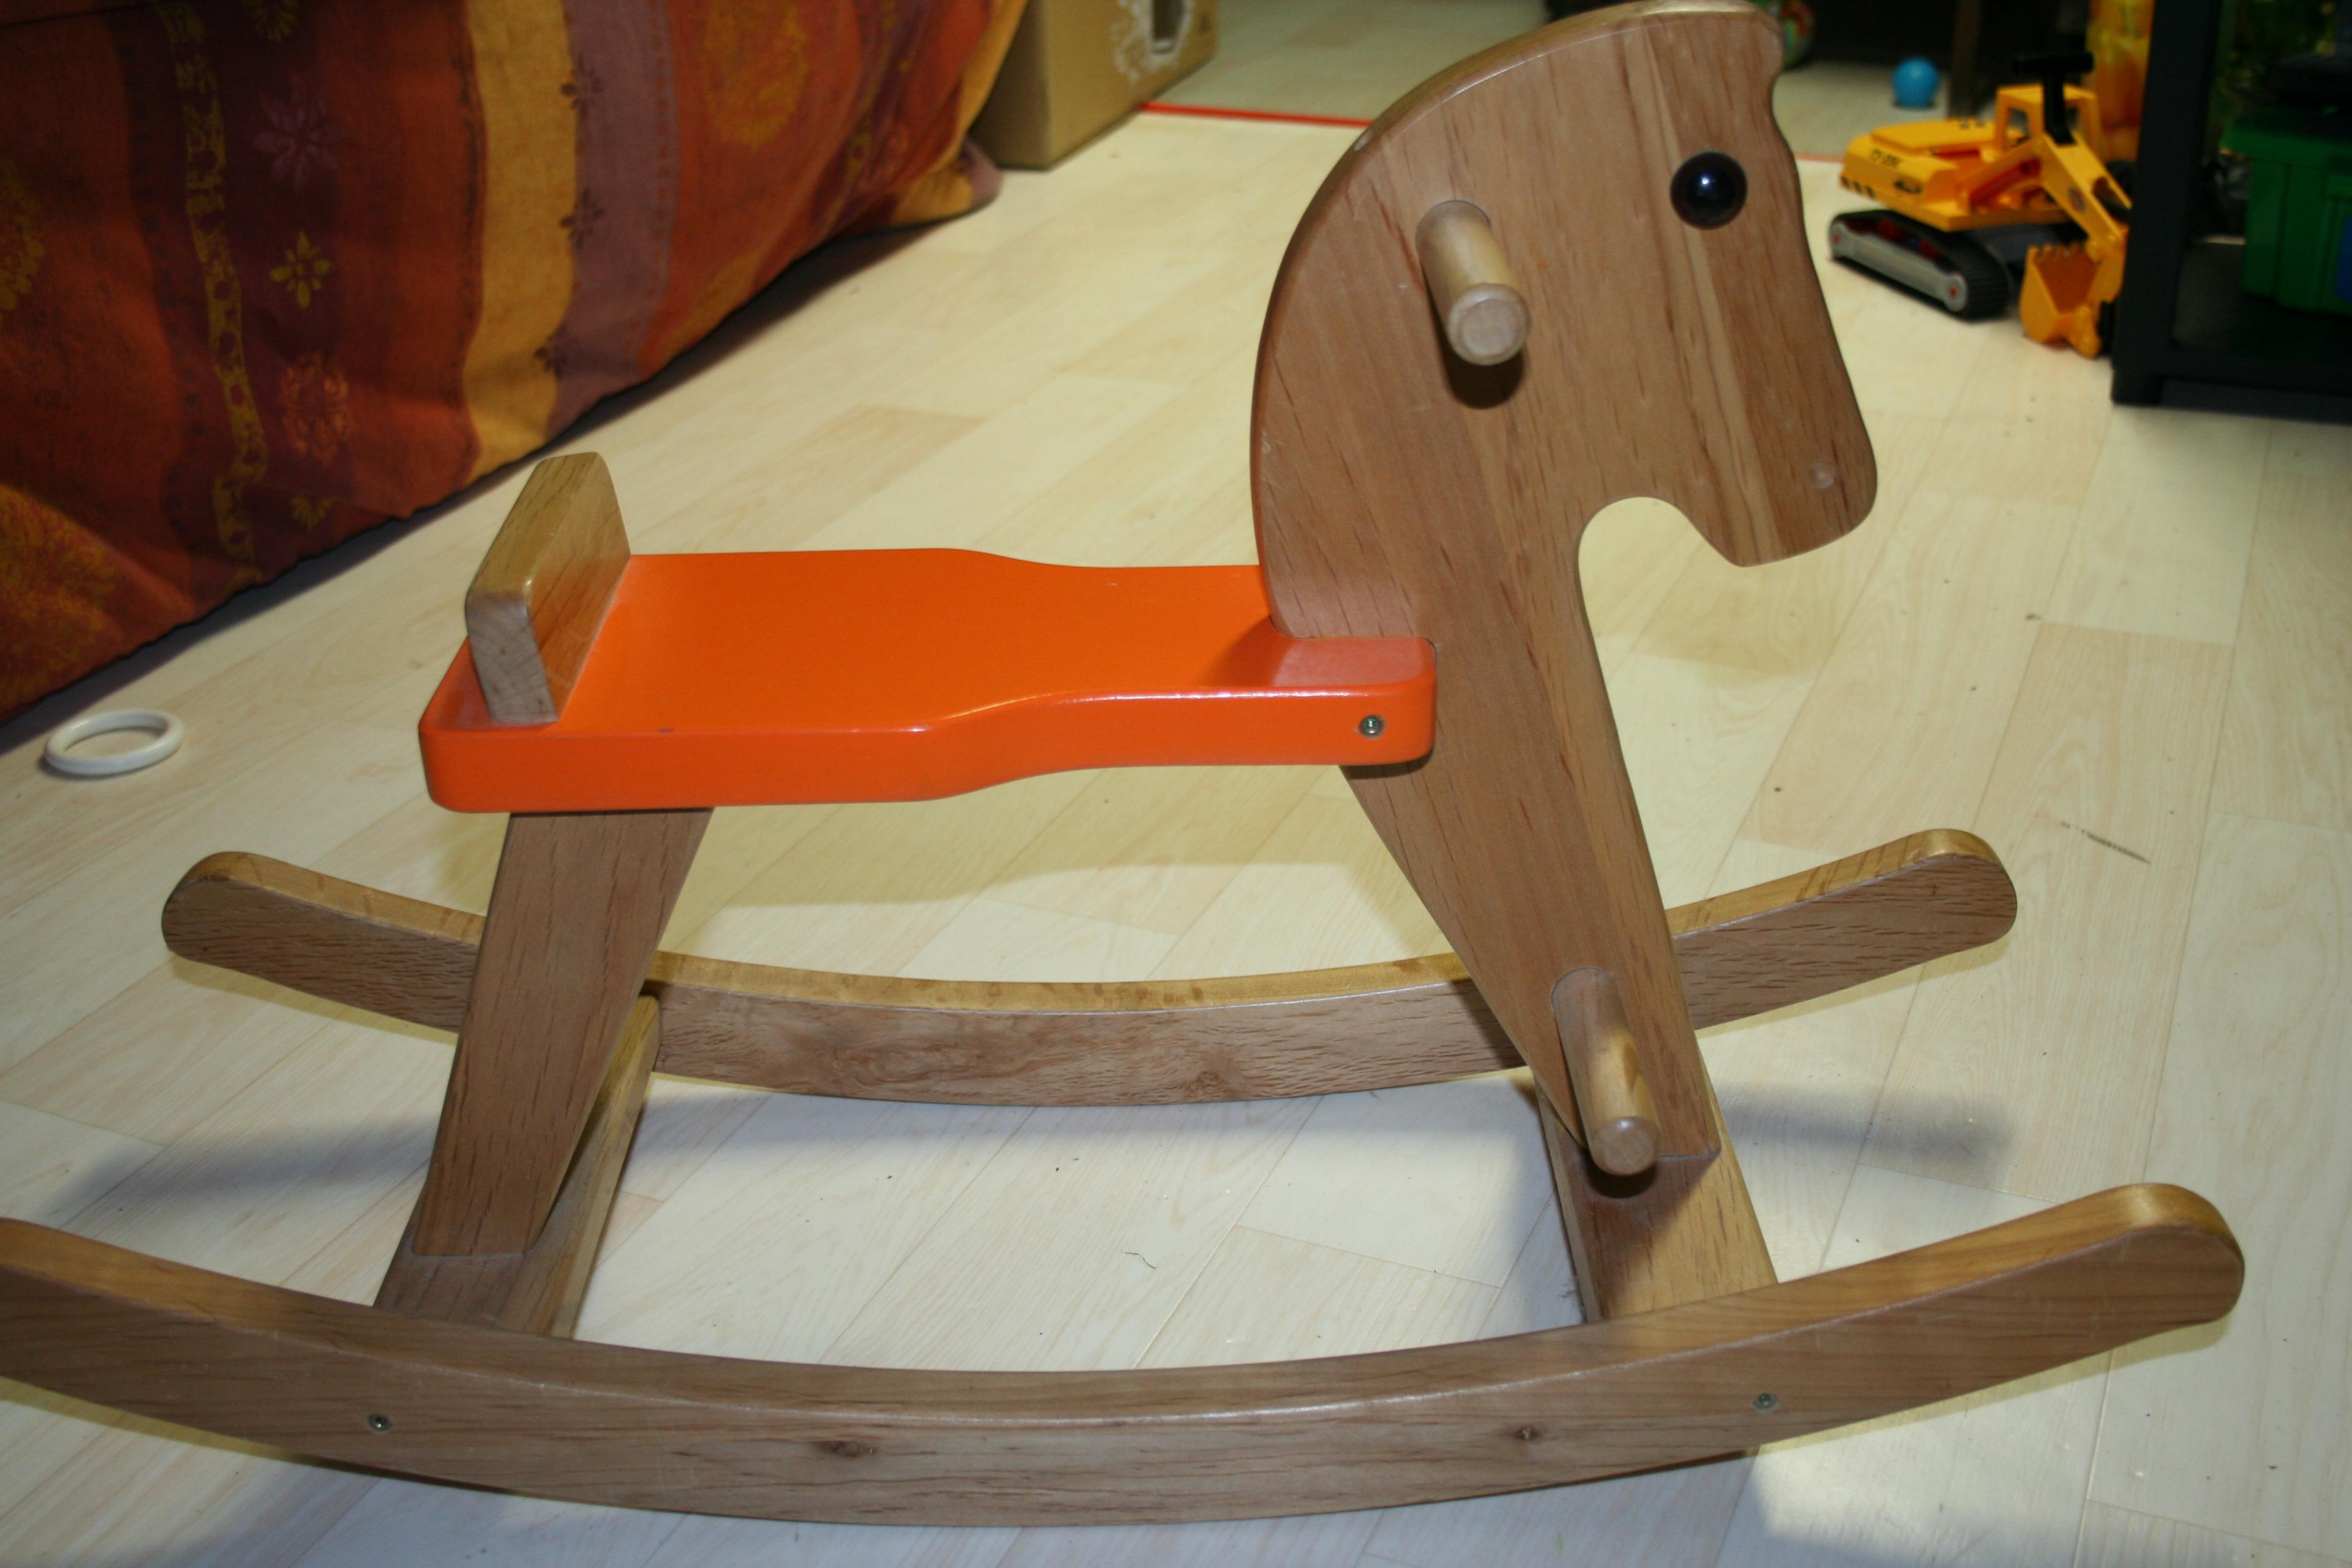 cheval bascule en bois 25 jouets quentheo. Black Bedroom Furniture Sets. Home Design Ideas